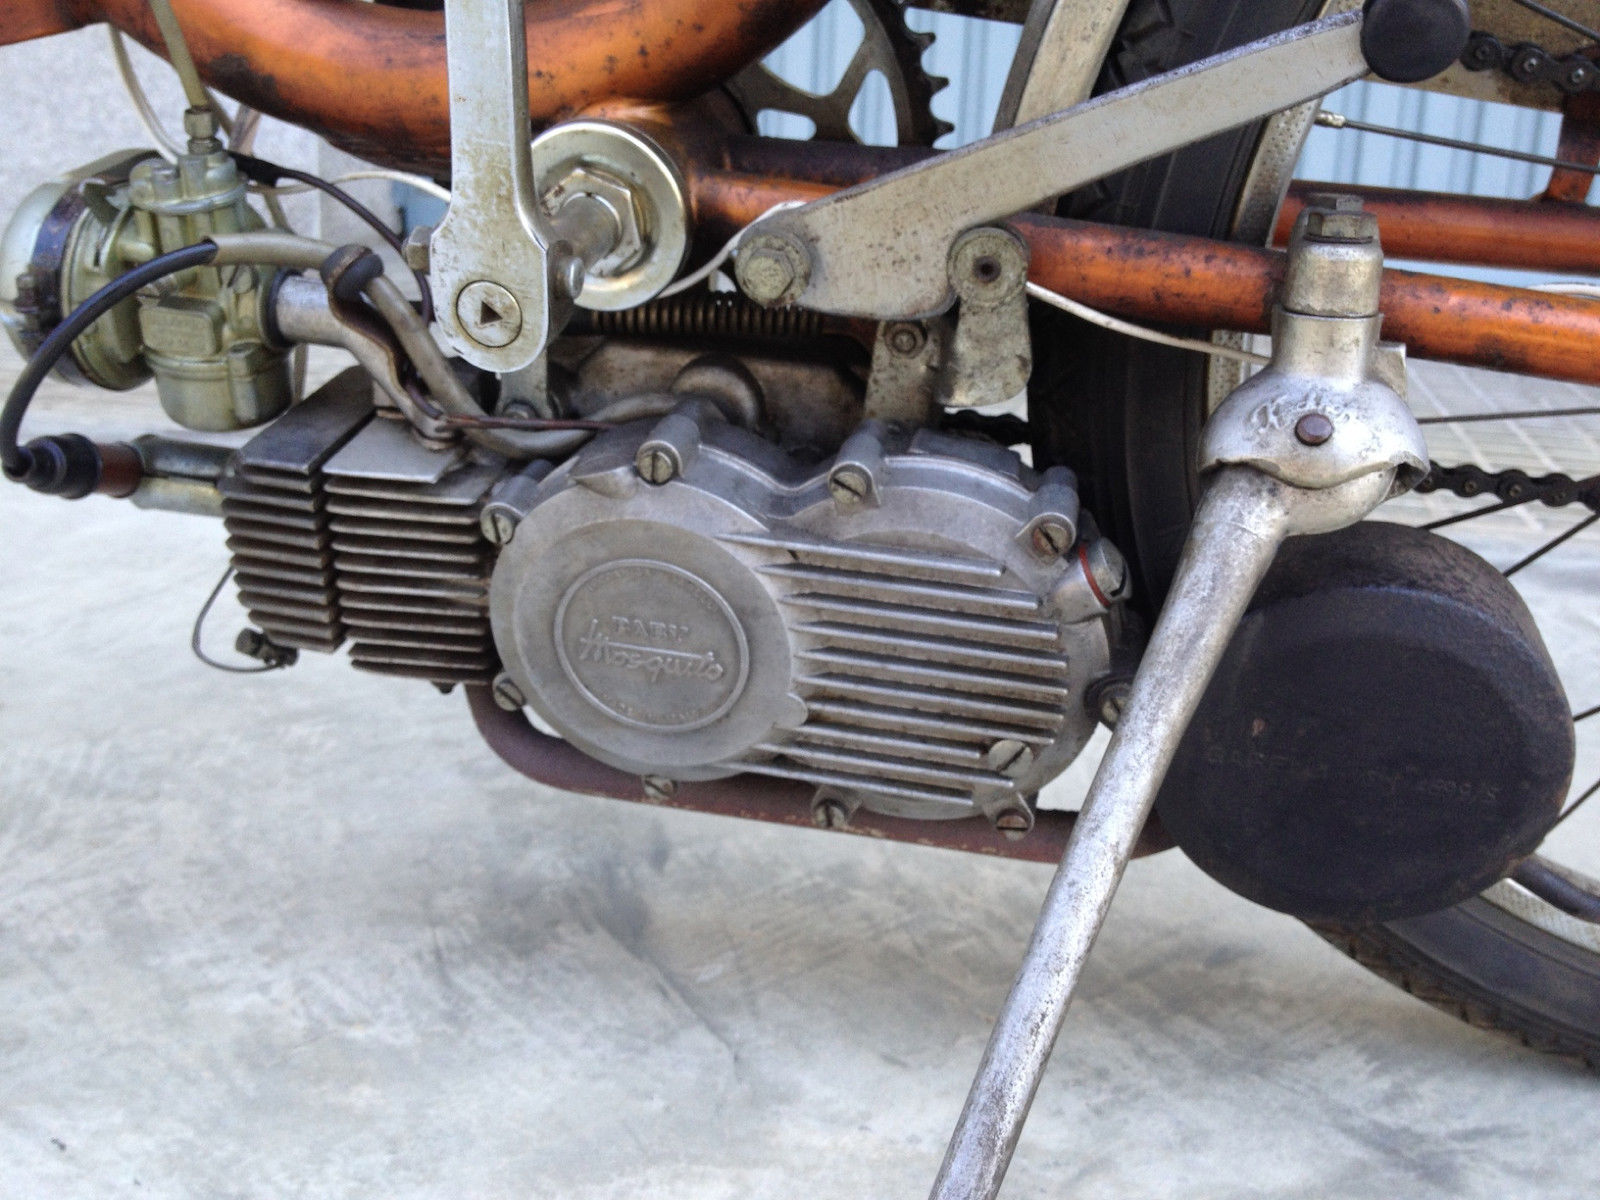 garelli moped manual